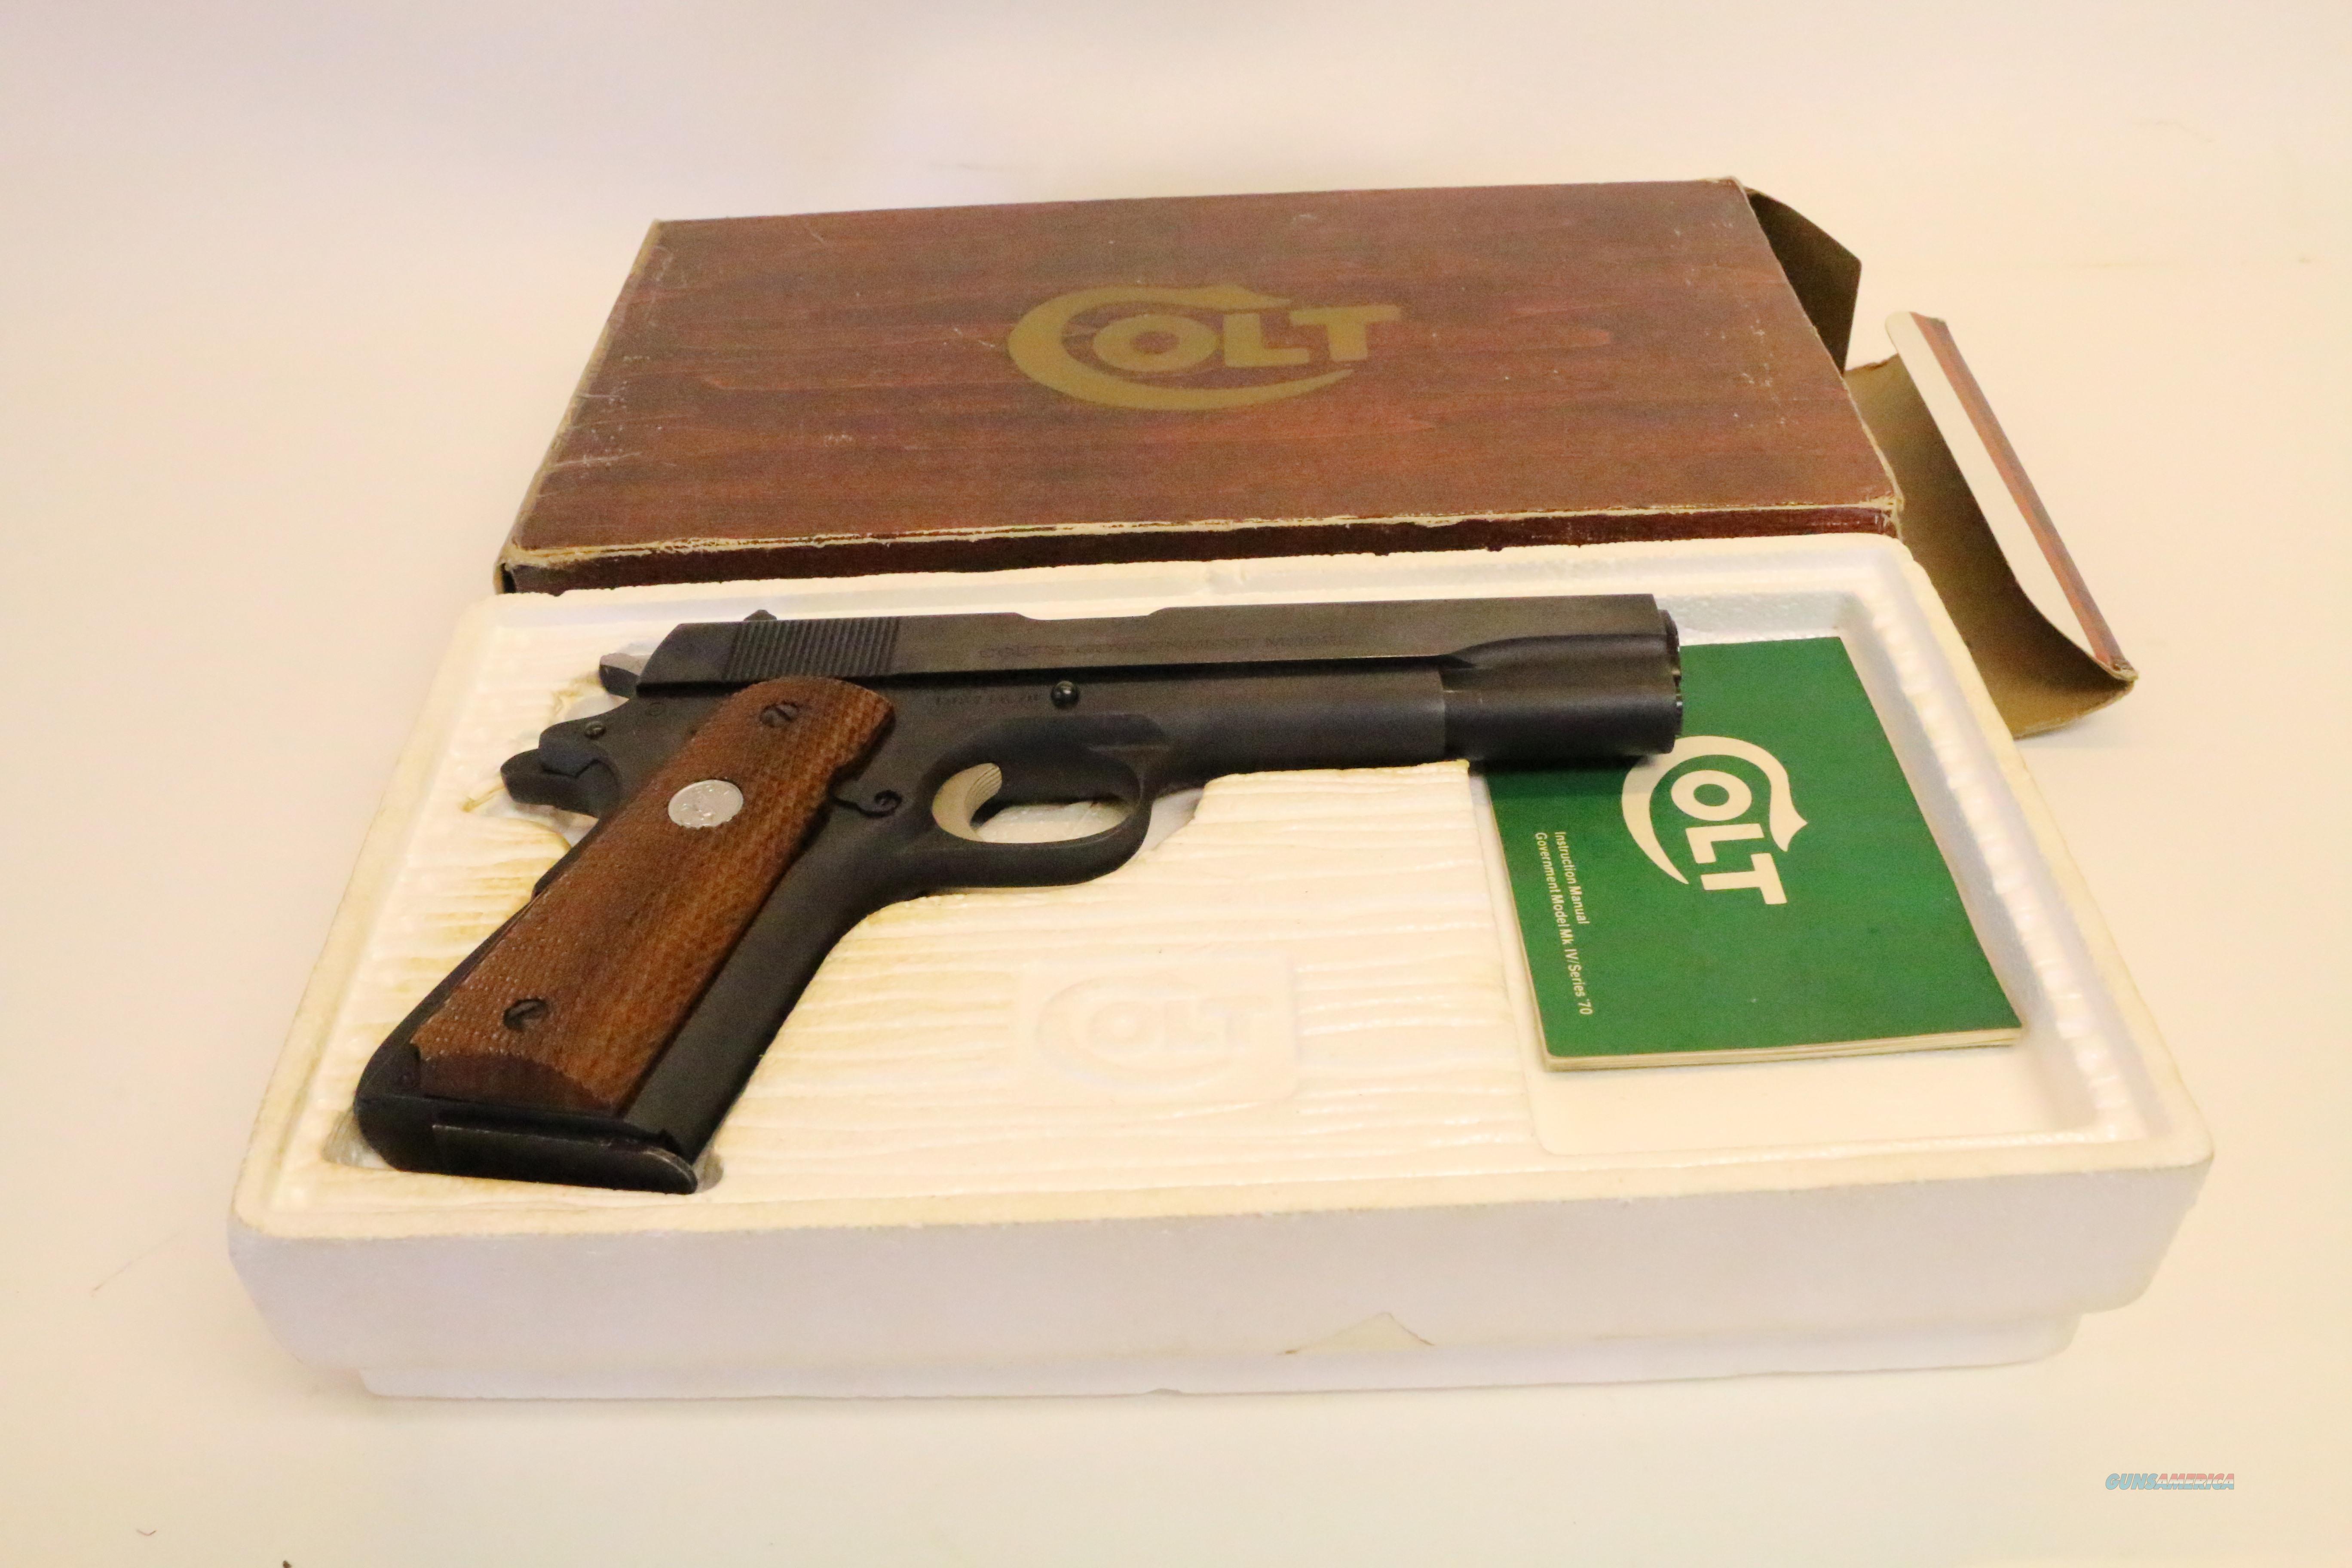 Minty 1976 NIB 70 Series Colt 1911 Government Model in Original Box